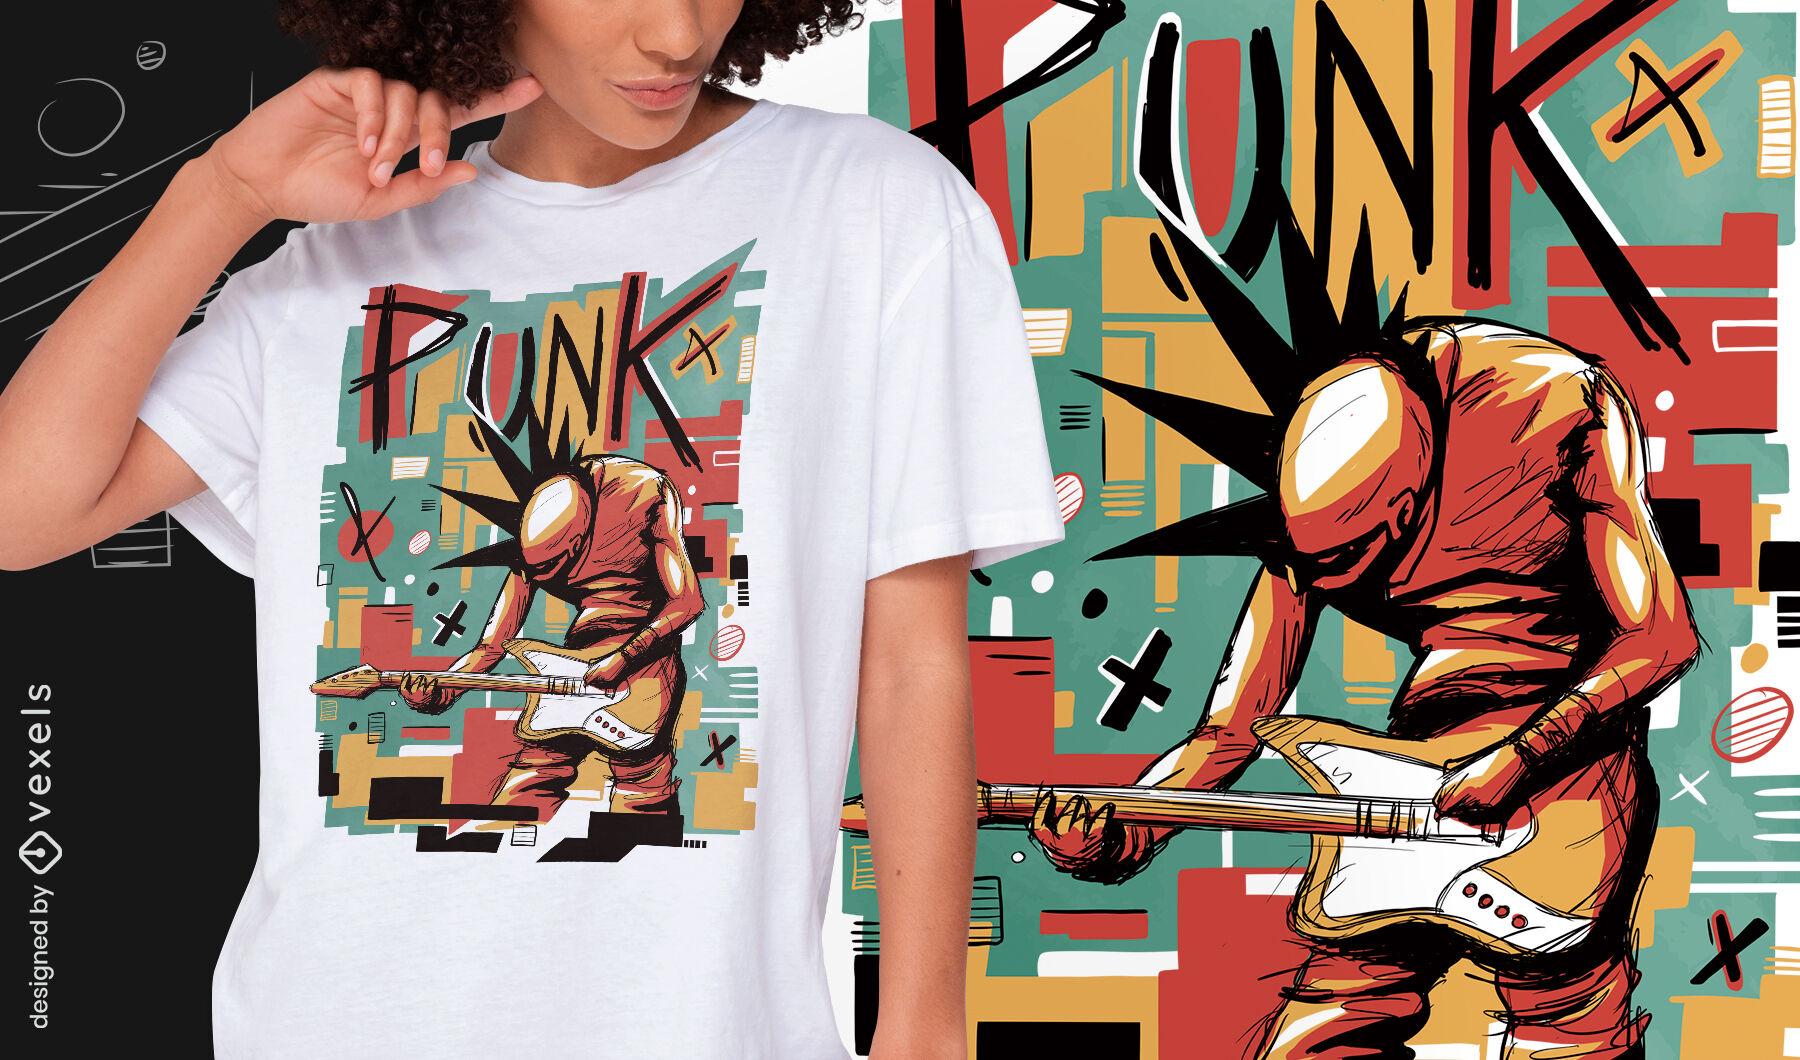 Camiseta psd abstracta de m?sico punk